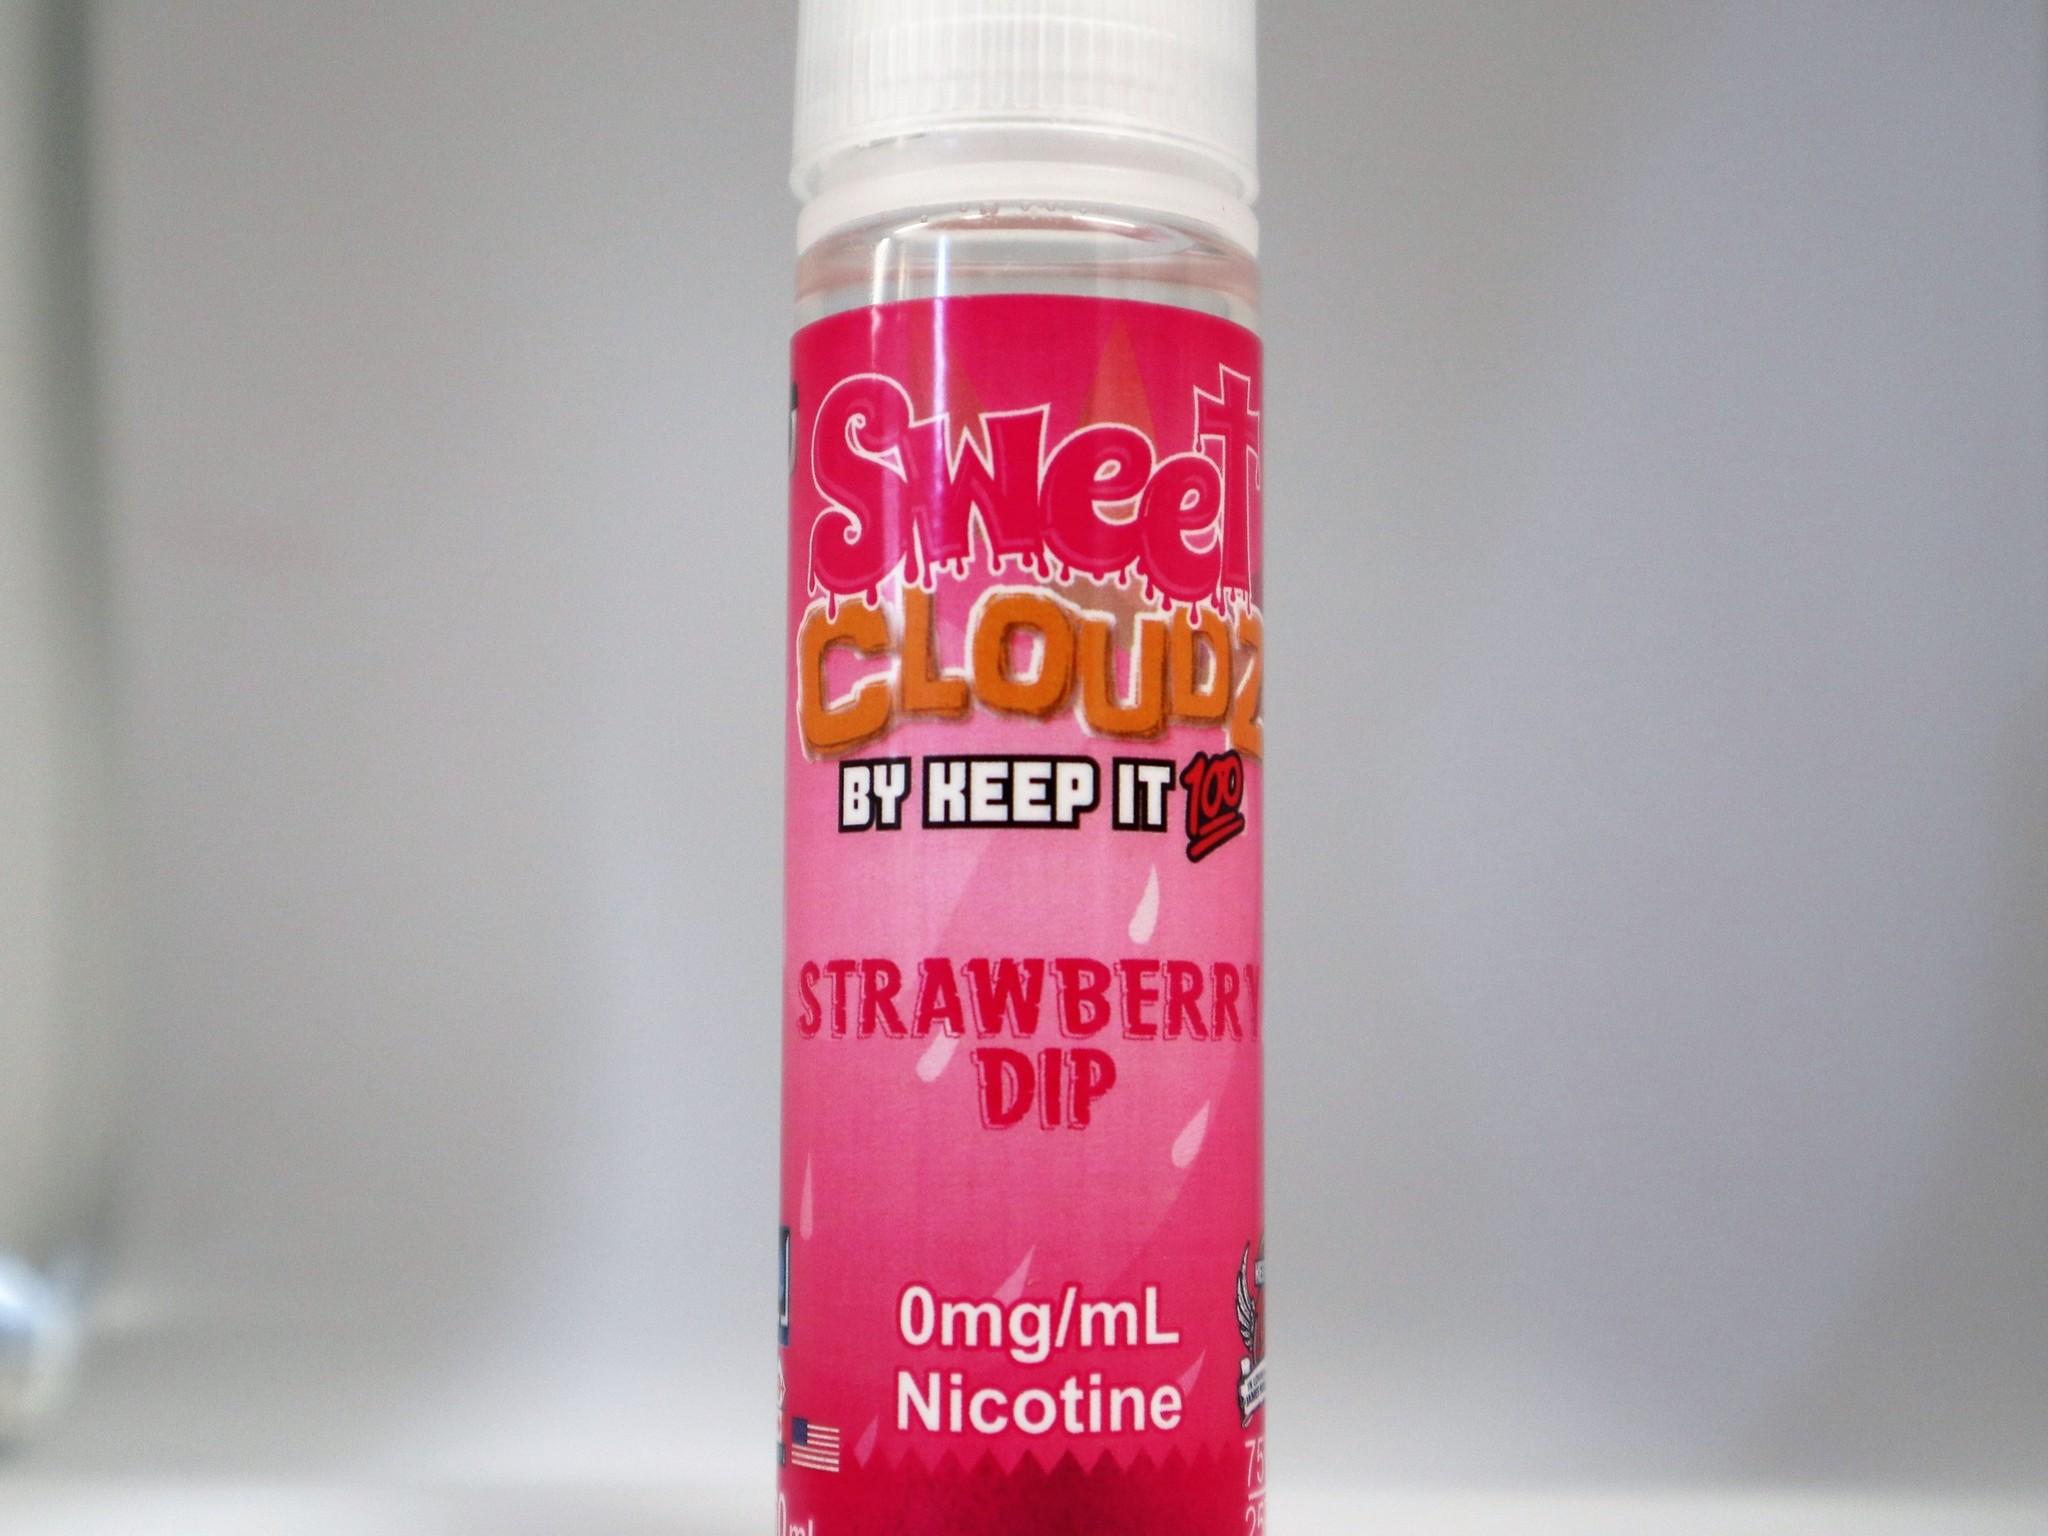 Keep it 100 Sweet Cloudz Strawberry Dip